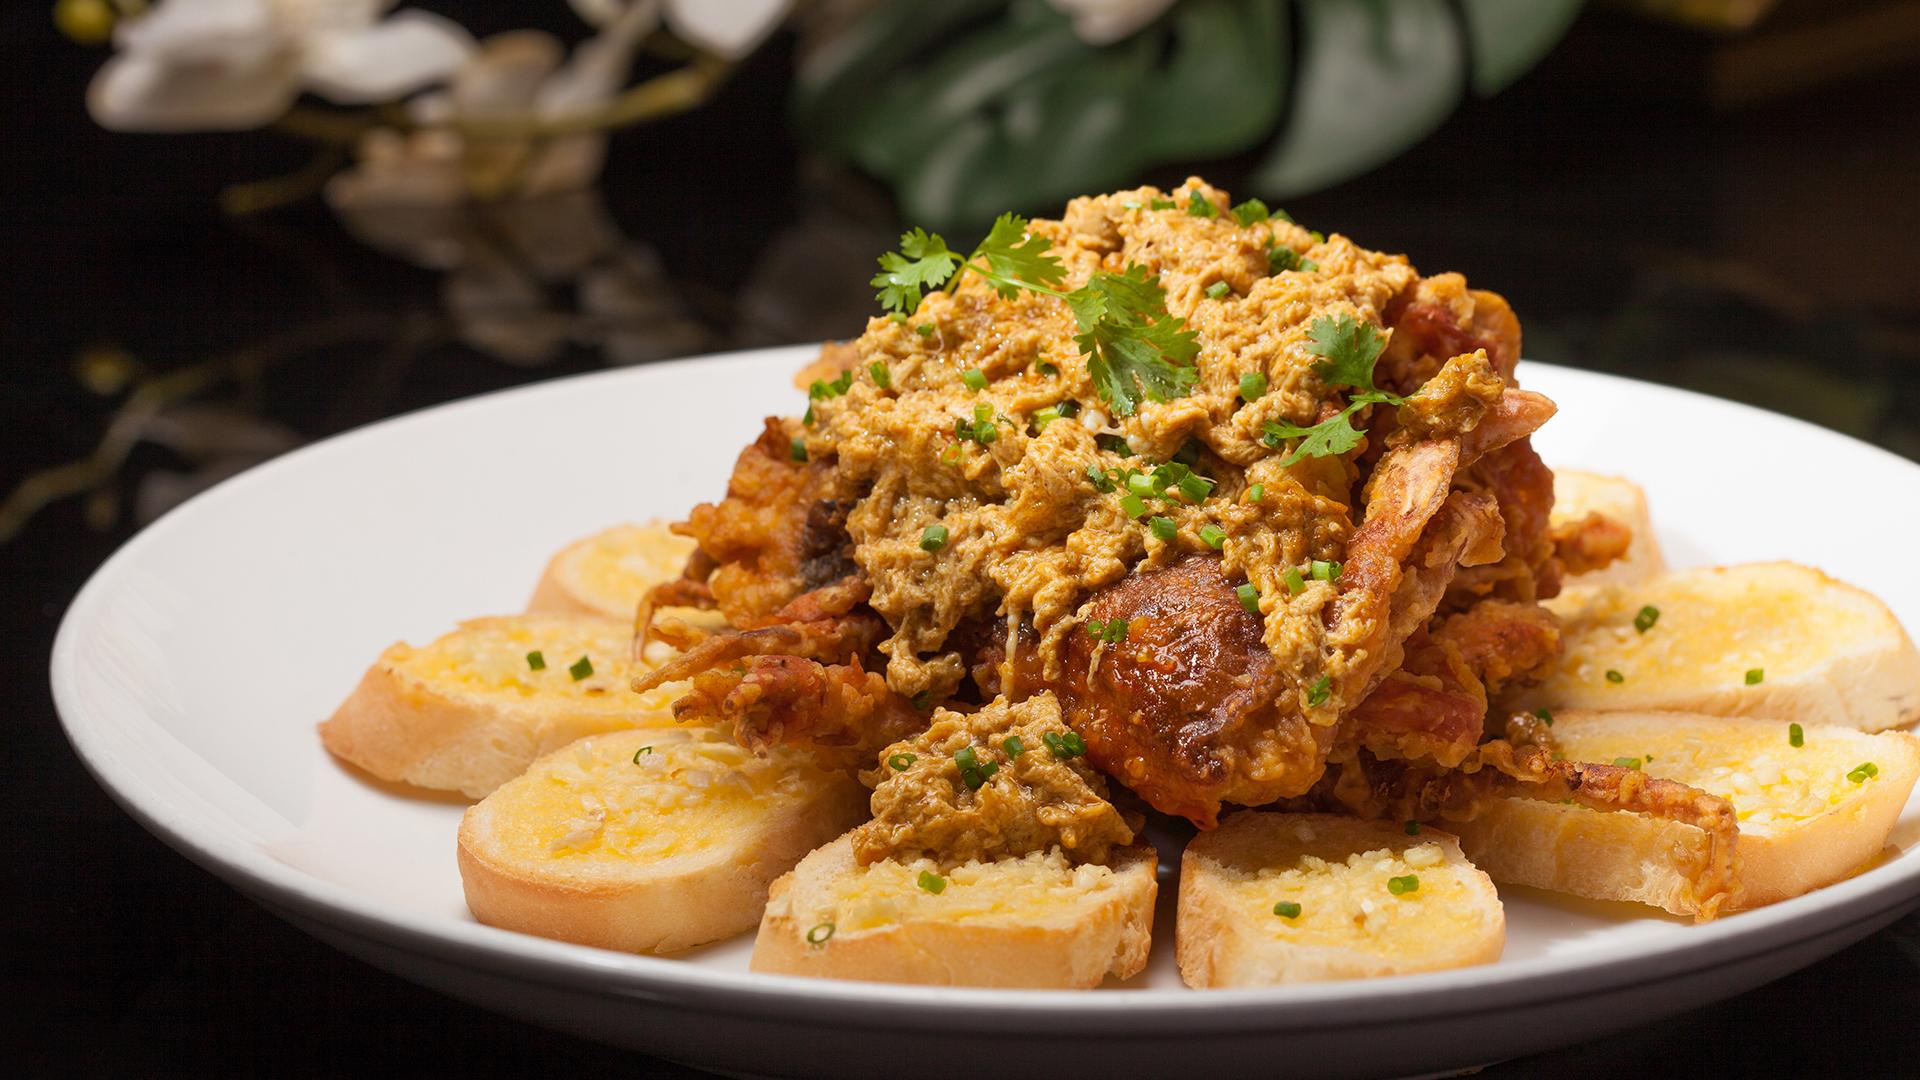 Lanpin- 咖哩軟殼蟹佐法國麵包